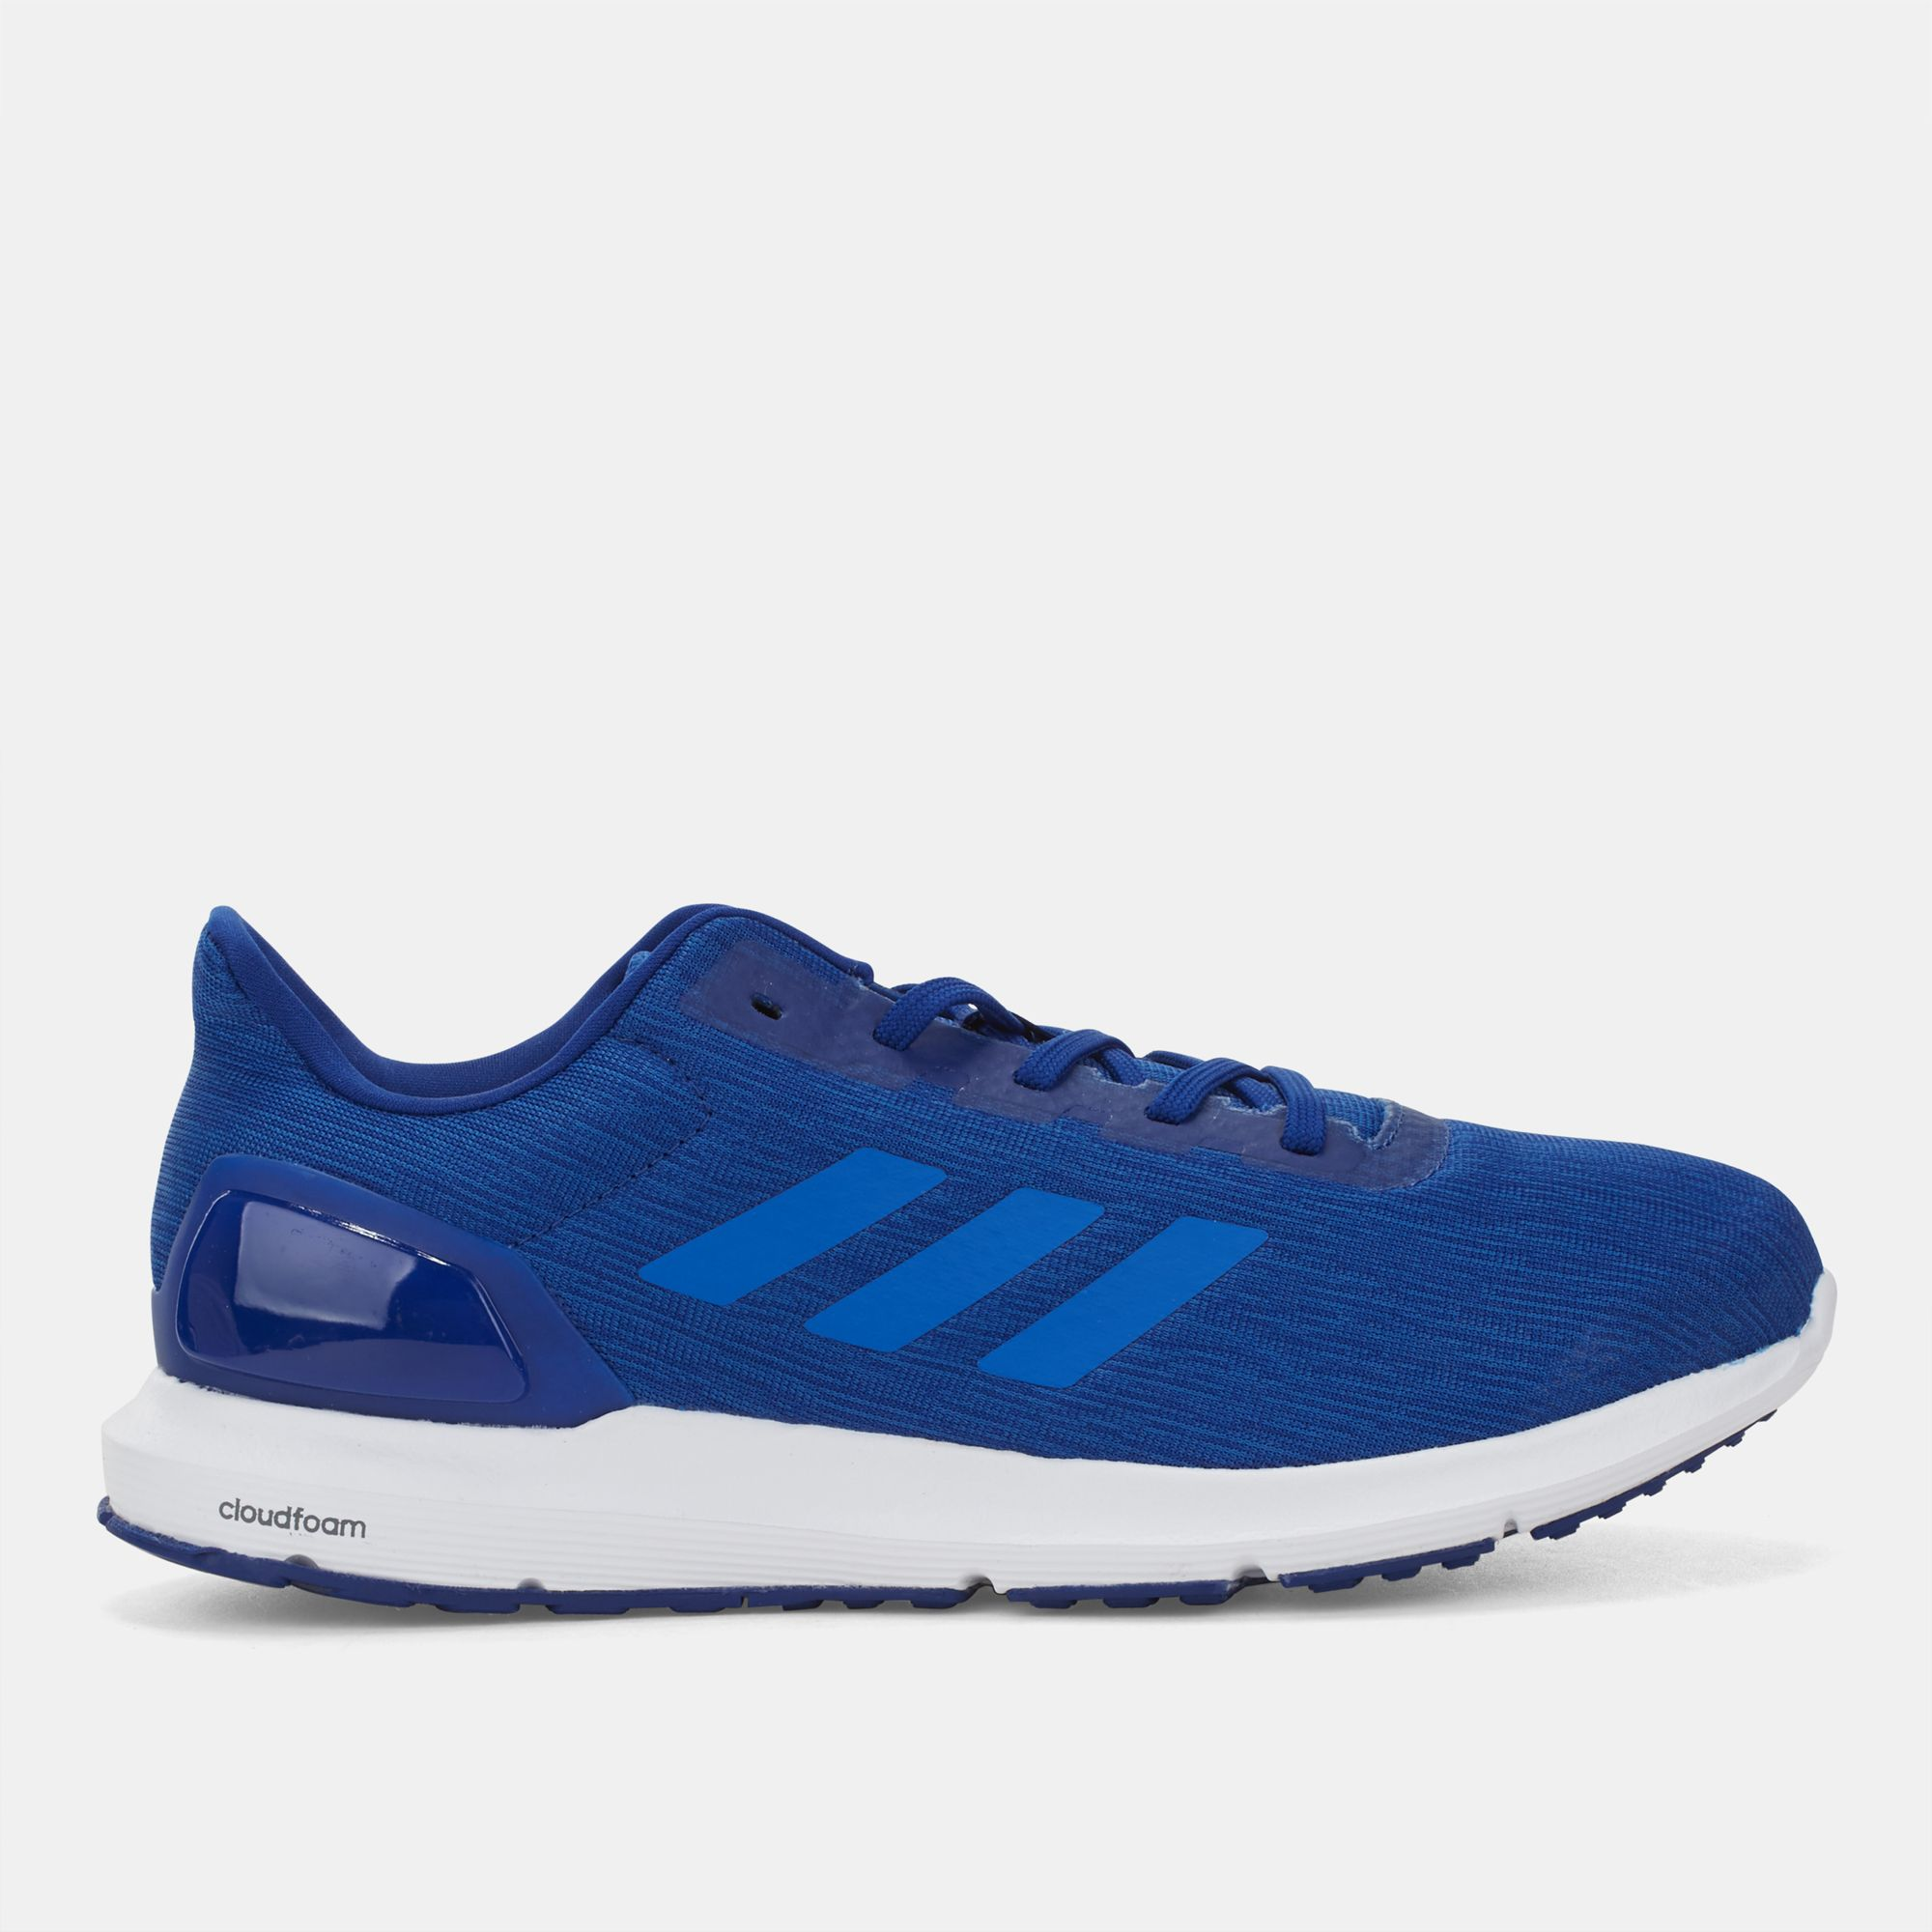 Adidas cosmico 2 scarpa da corsa adft bb3584 a riyadh, ksa sss